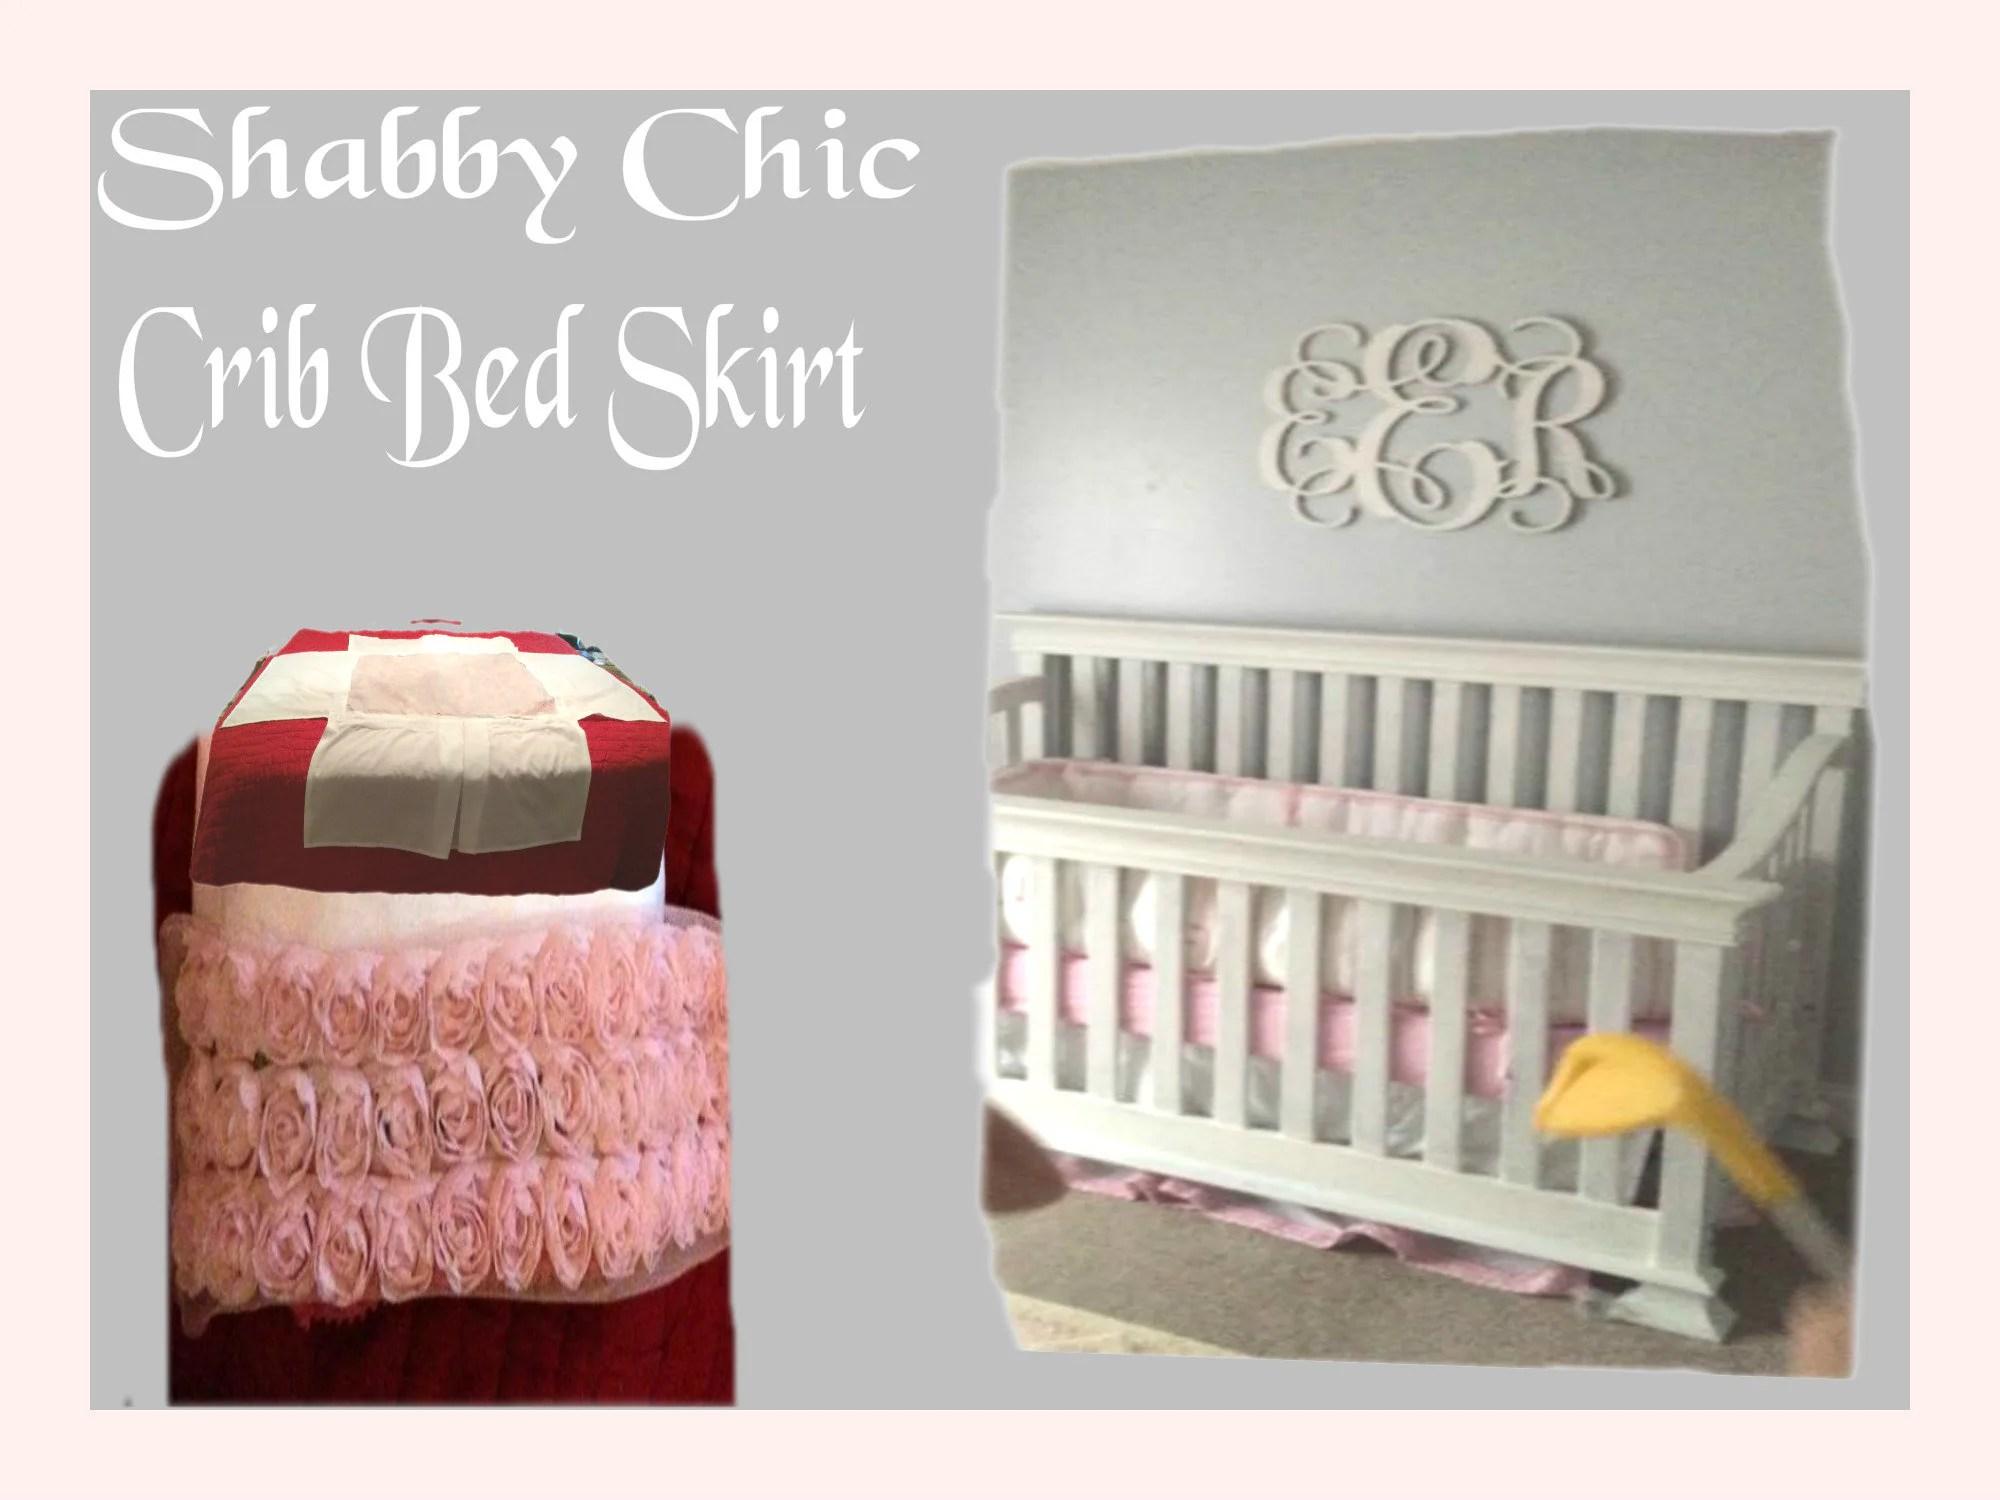 Masterly Rose Standard Crib Size Quilt Dimensions Standard Size Crib Dust Ruffle Reduced Shipping Handmade Shabby Crib Bedskirt Handmade Shabby Crib Bedskirt Baby Baby Rose Trim baby Standard Crib Size